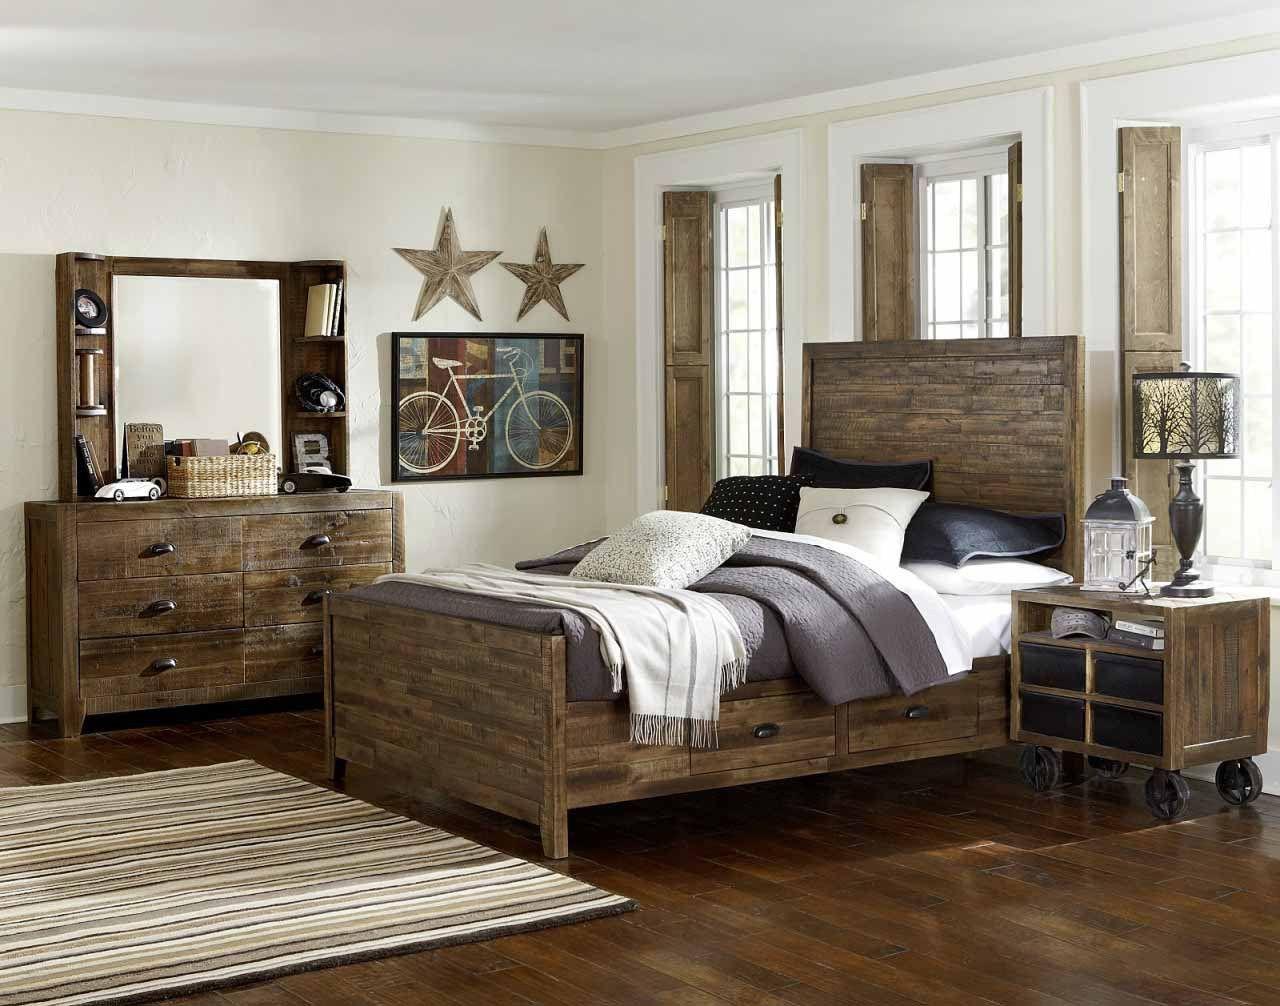 The Country Taste Of Distressed Wood Bedroom Furniture | Bedroom ...